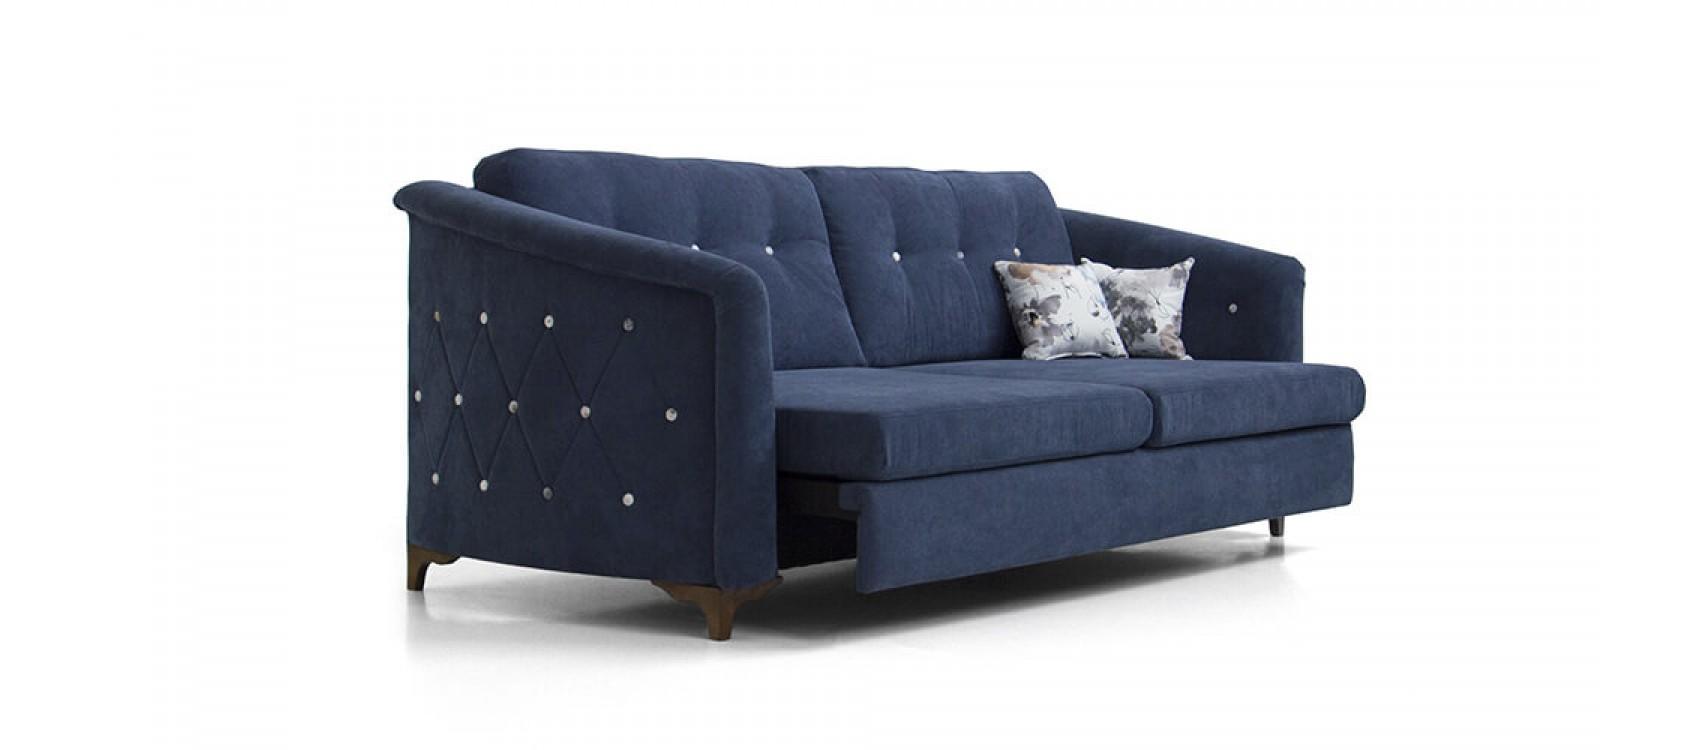 Sofa MAXBURG фото 3